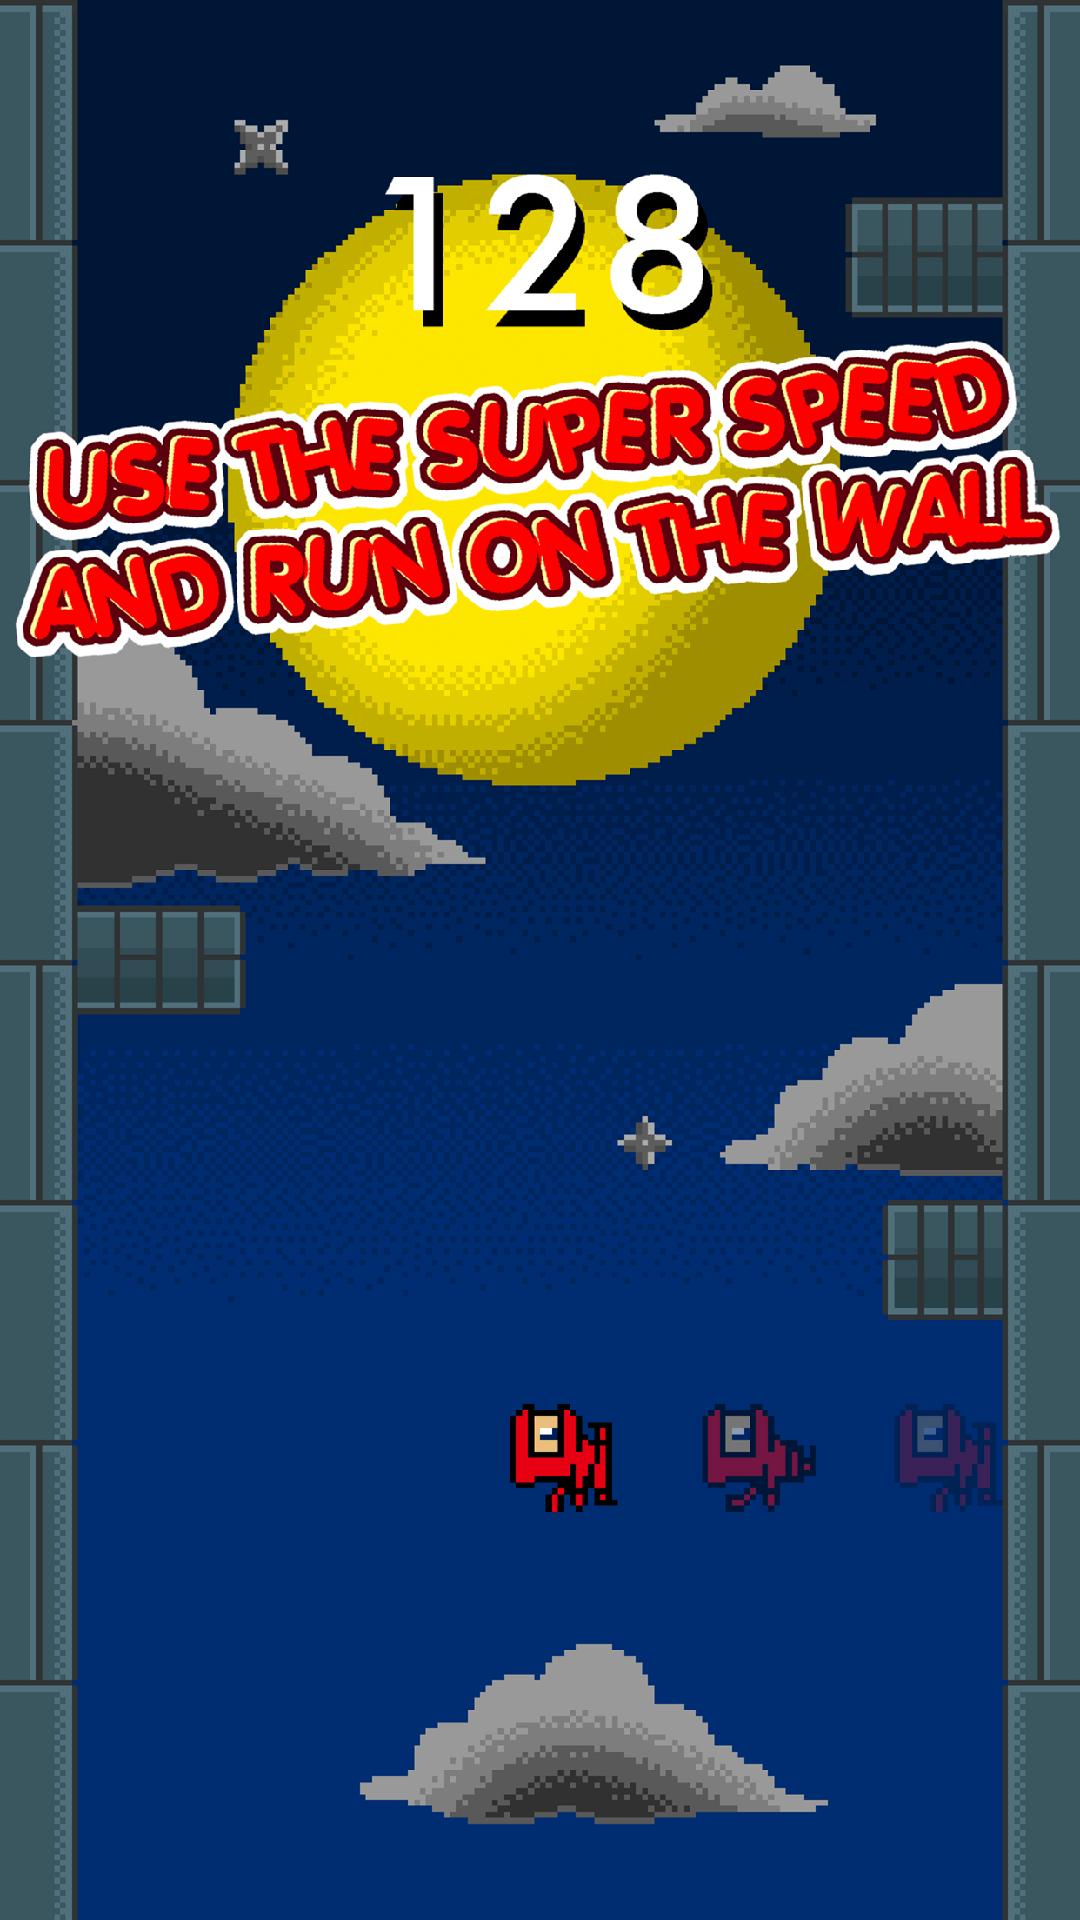 Speedy Ninja Bouncer - Invincible 8 Bit Retro Wall Brick ...